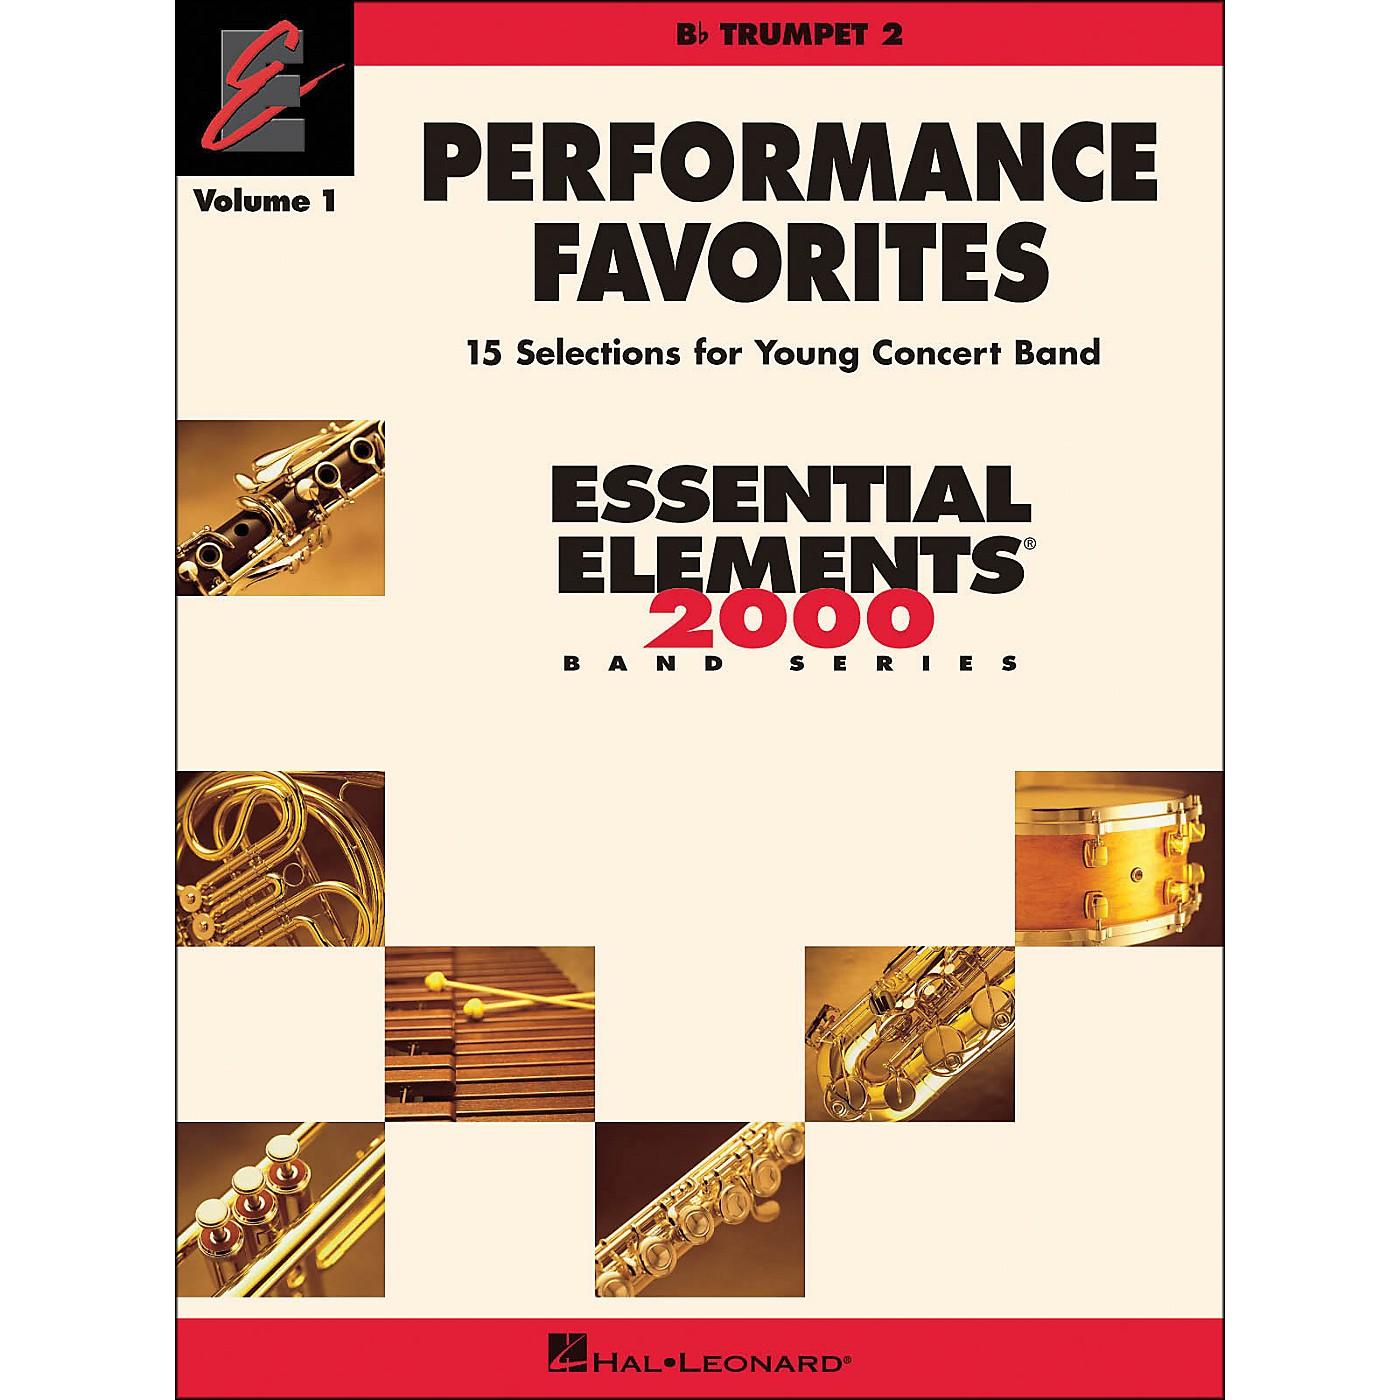 Hal Leonard Performance Favorites Volume 1 Trumpet 2 thumbnail